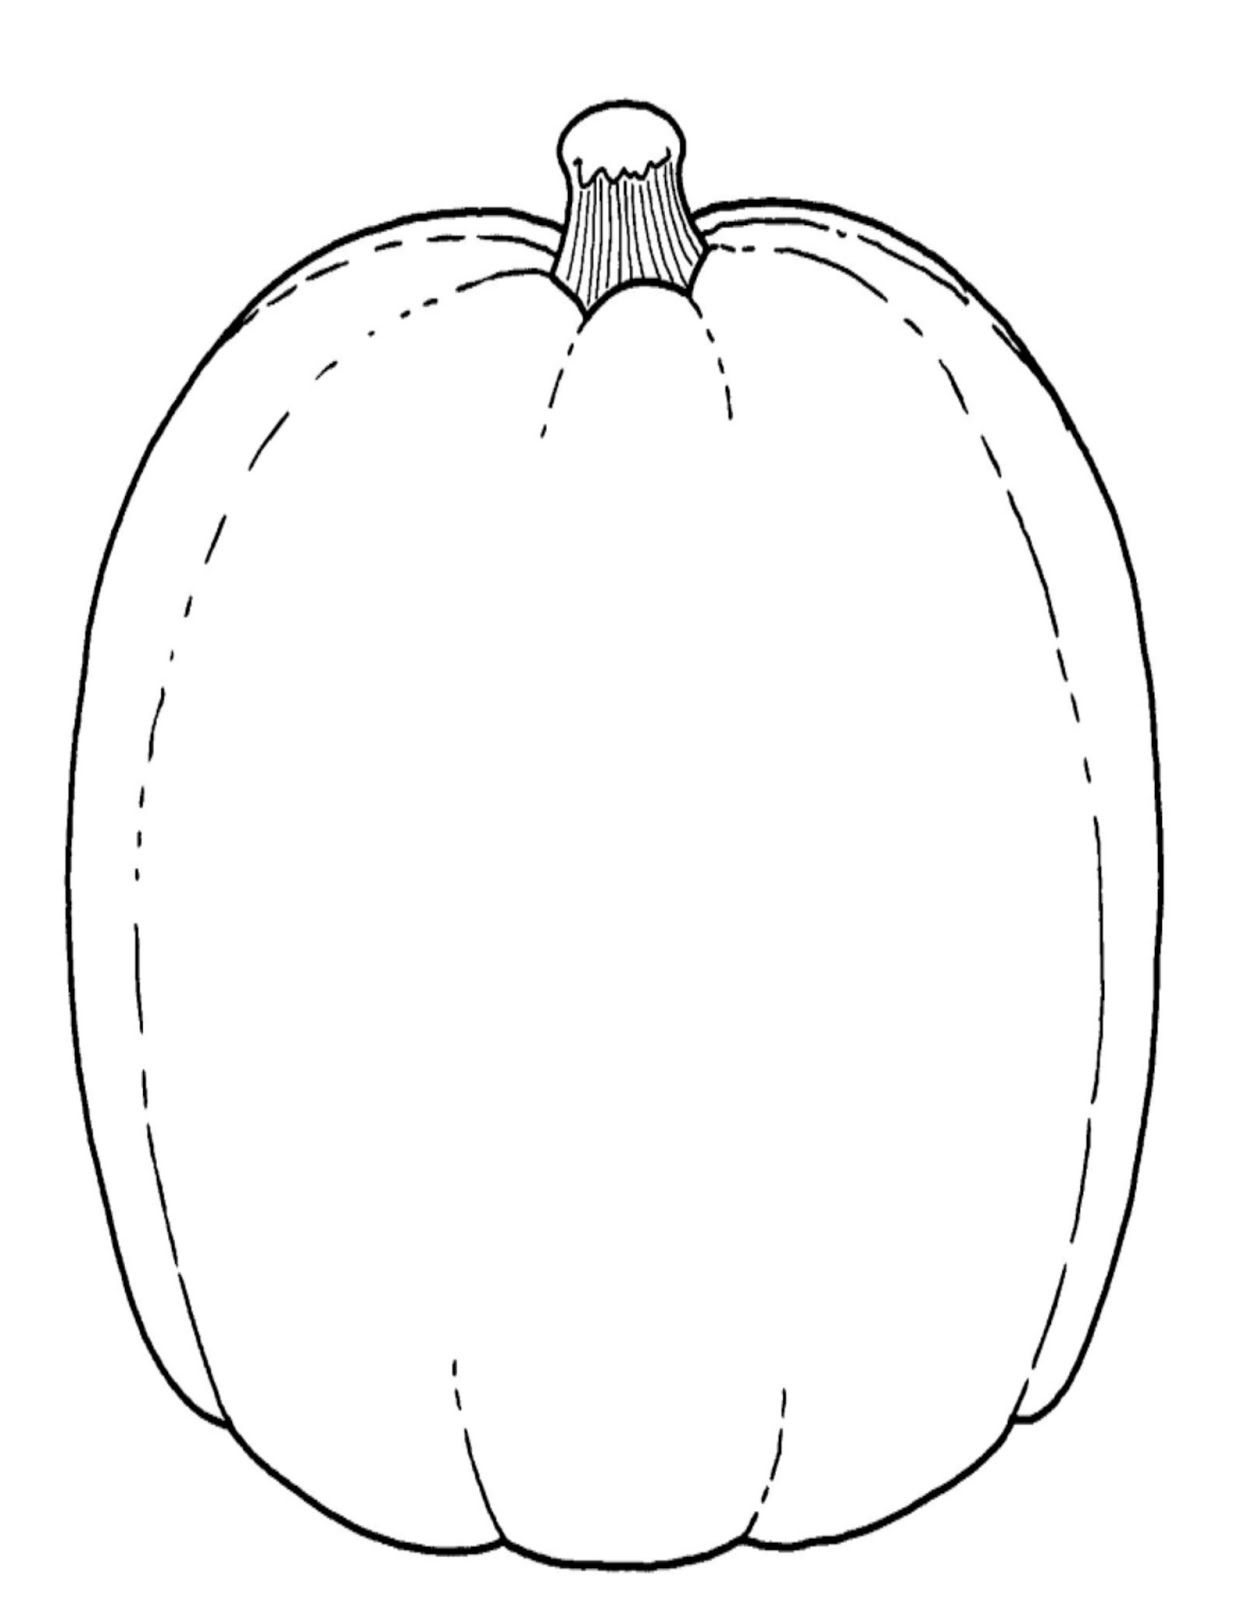 blank pumpkin template - Google Search | Pumpkin coloring ...